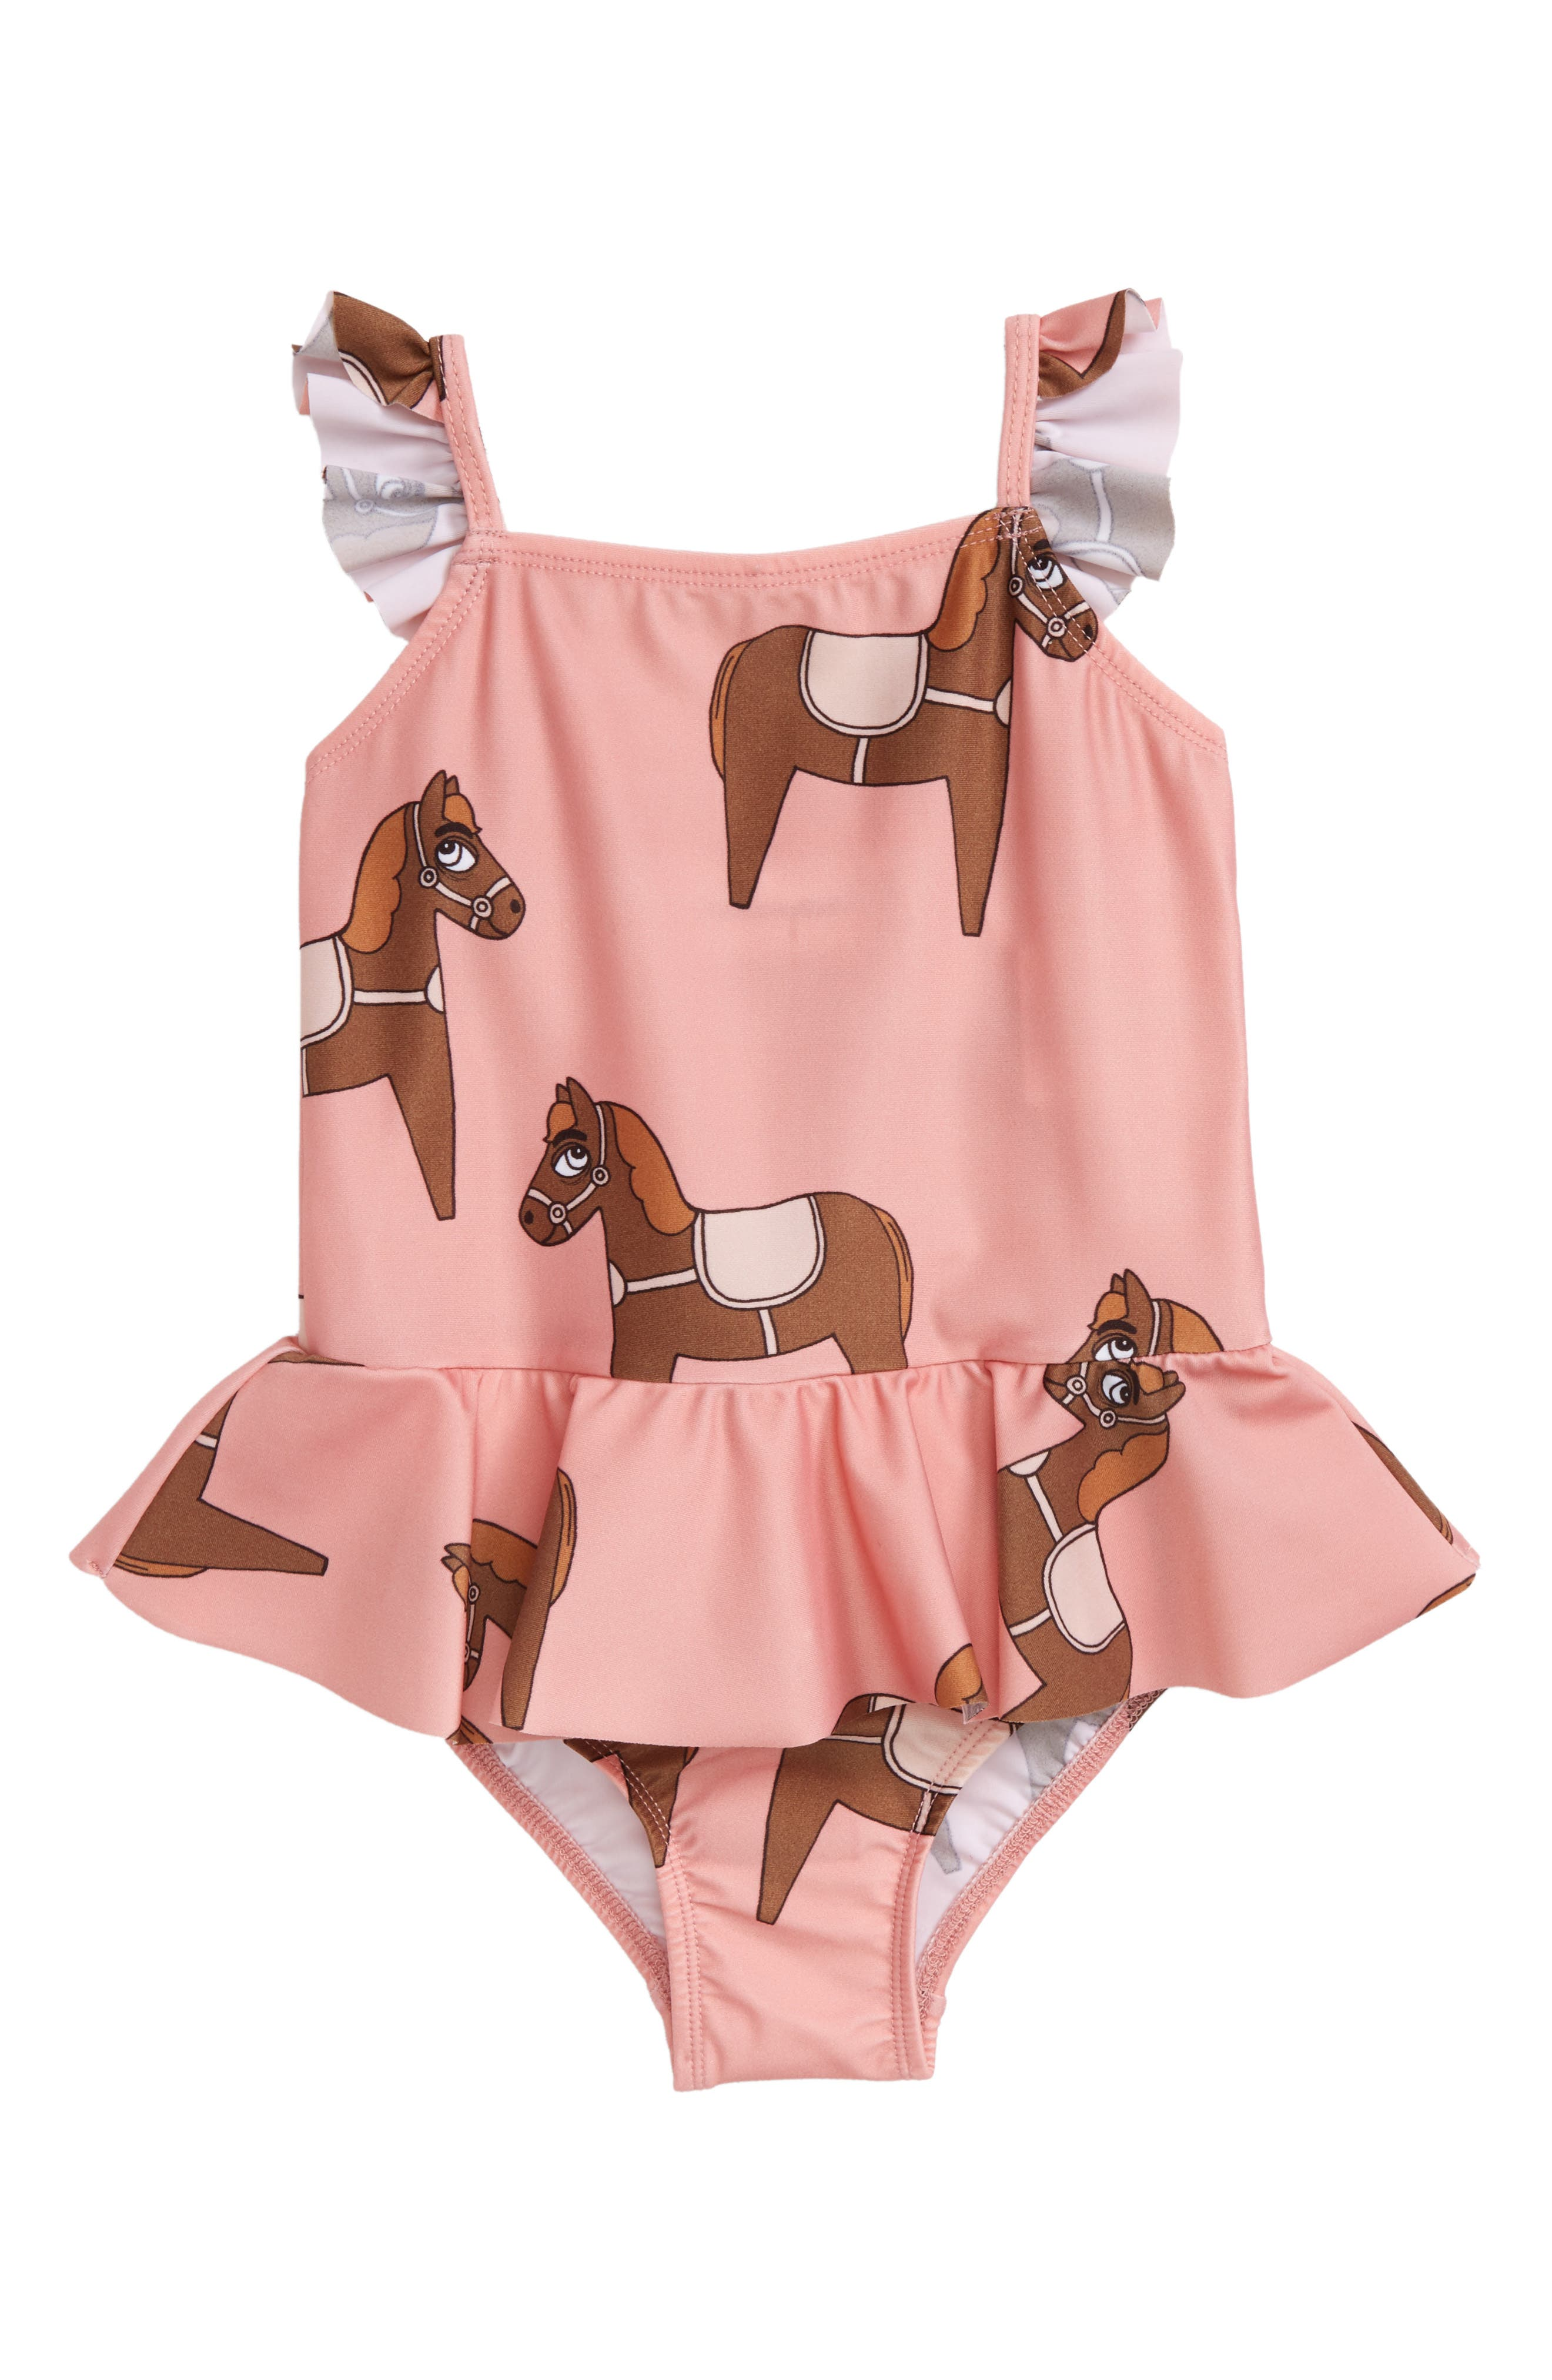 Main Image - Mini Rodini Horse Skirted One-Piece Swimsuit (Toddler Girls & Little Girls)